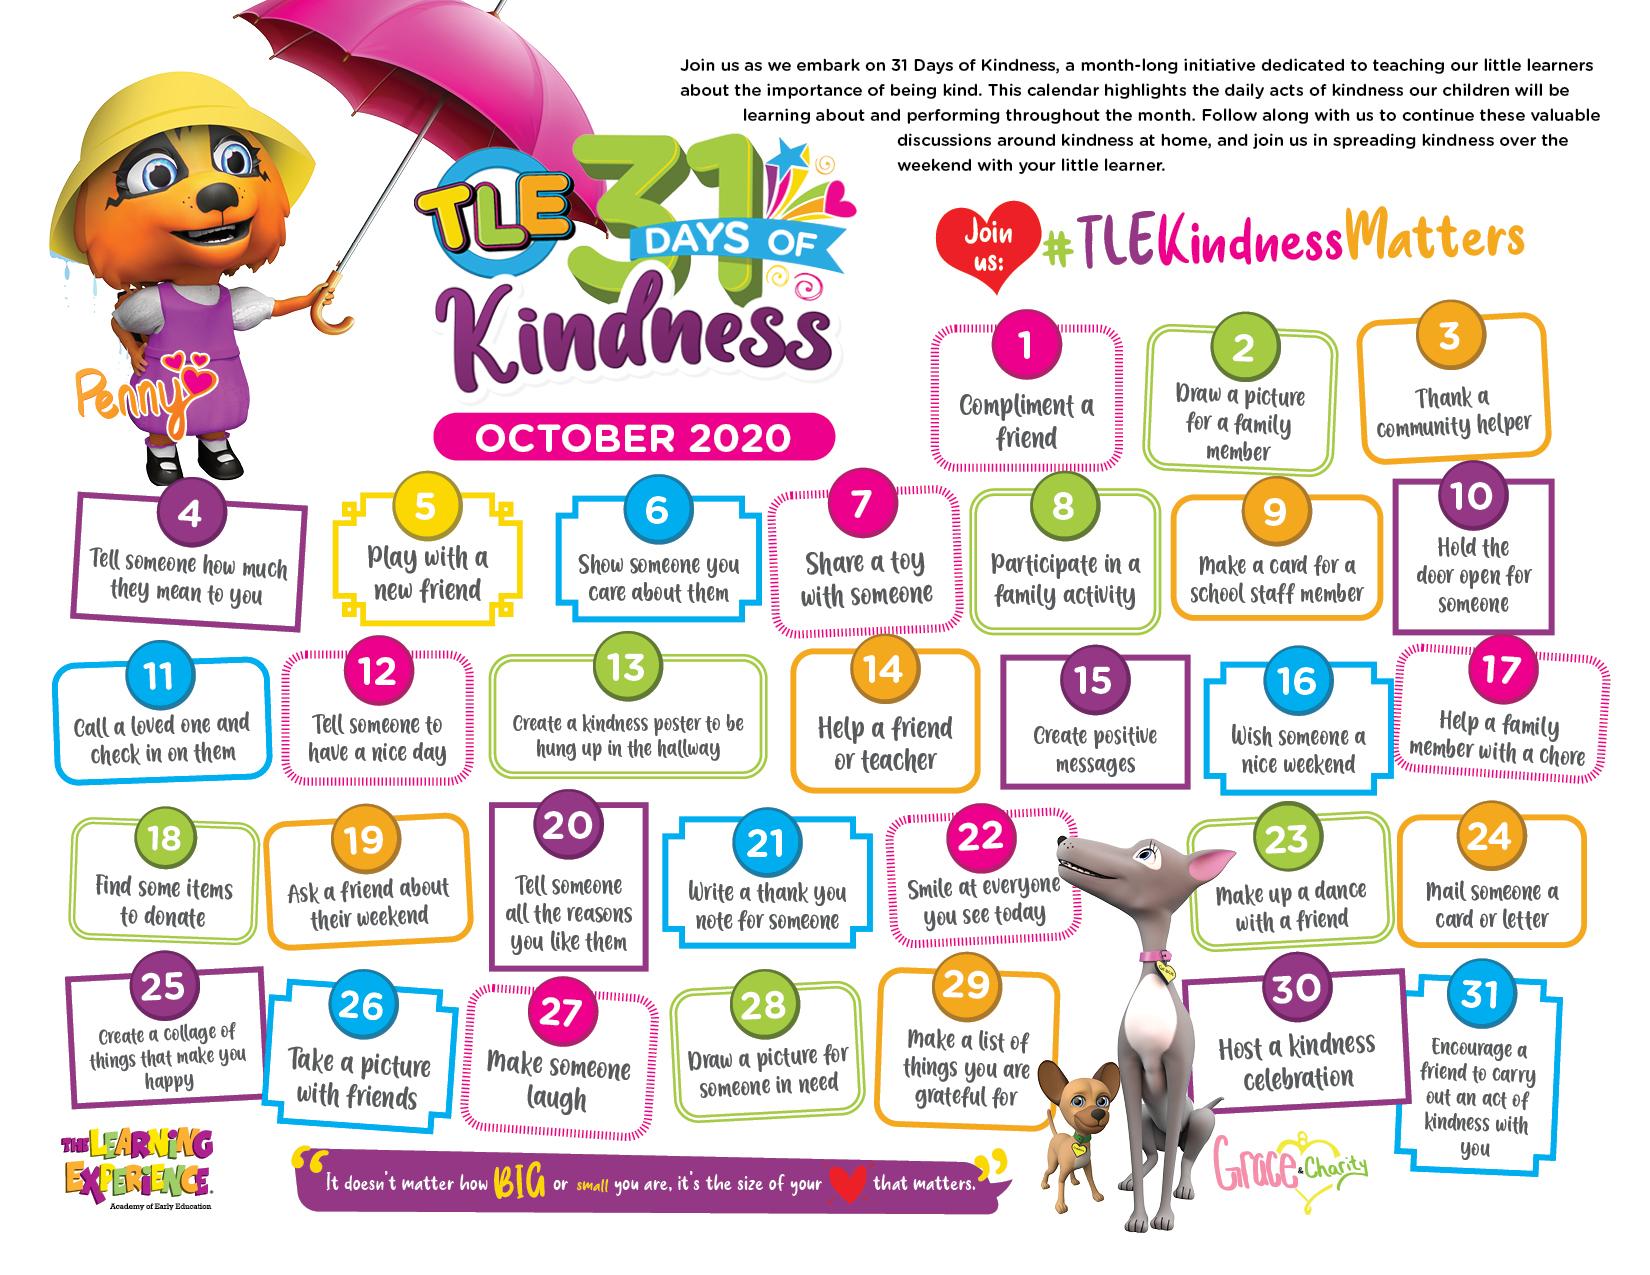 31Daysofkindness Calendarindd